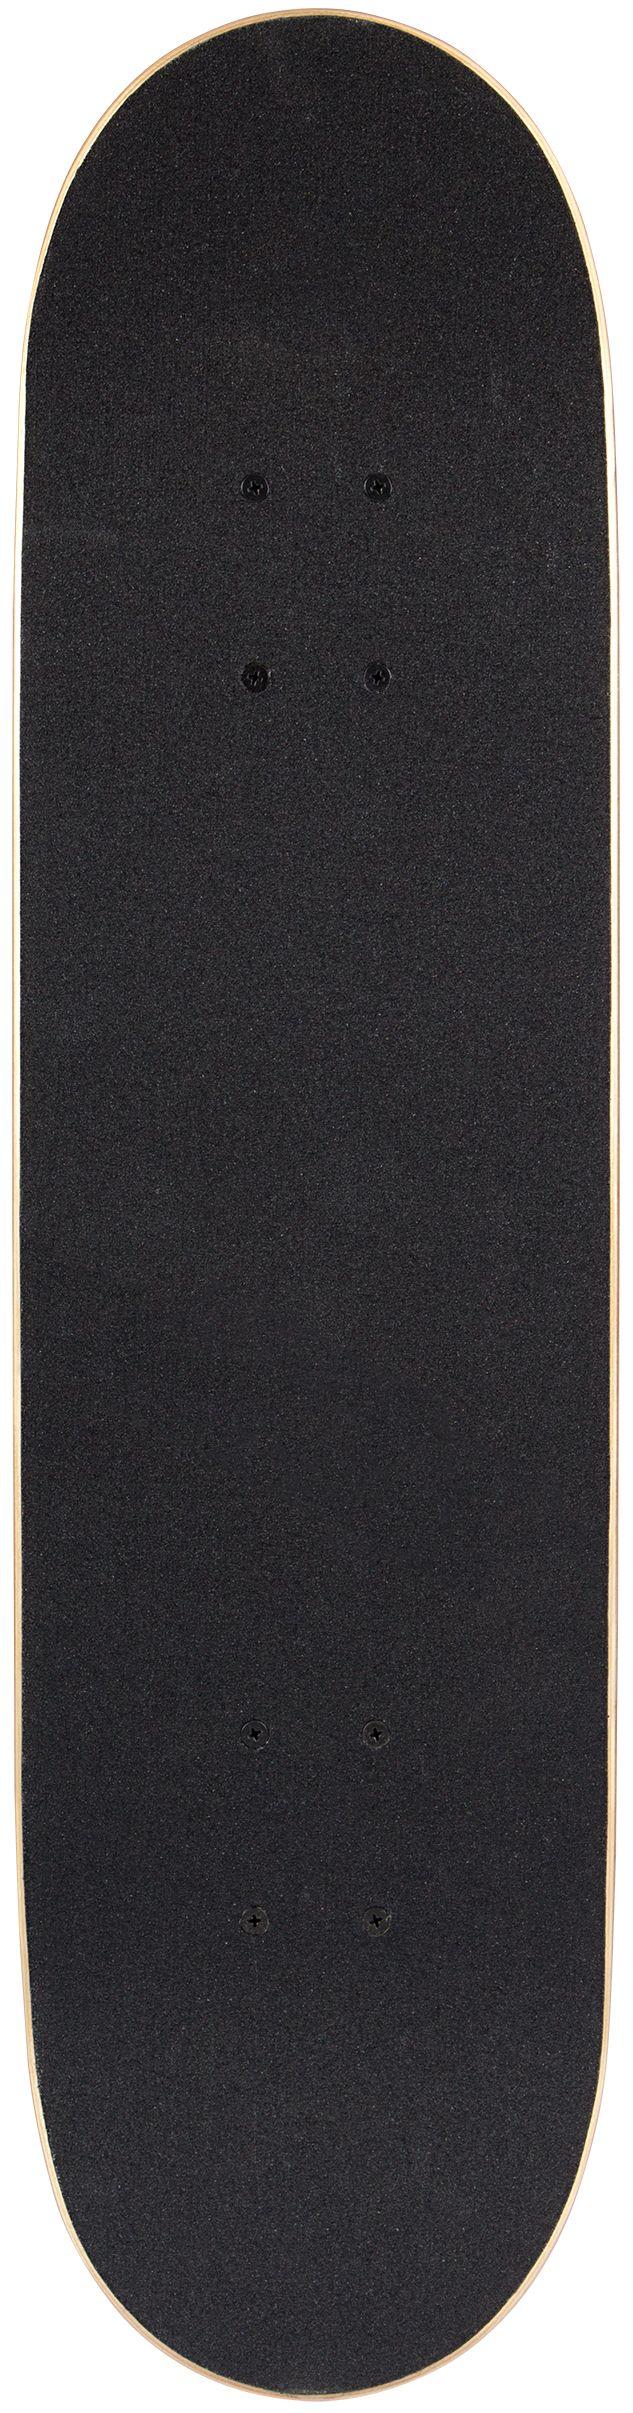 52NT-RGB-DECK